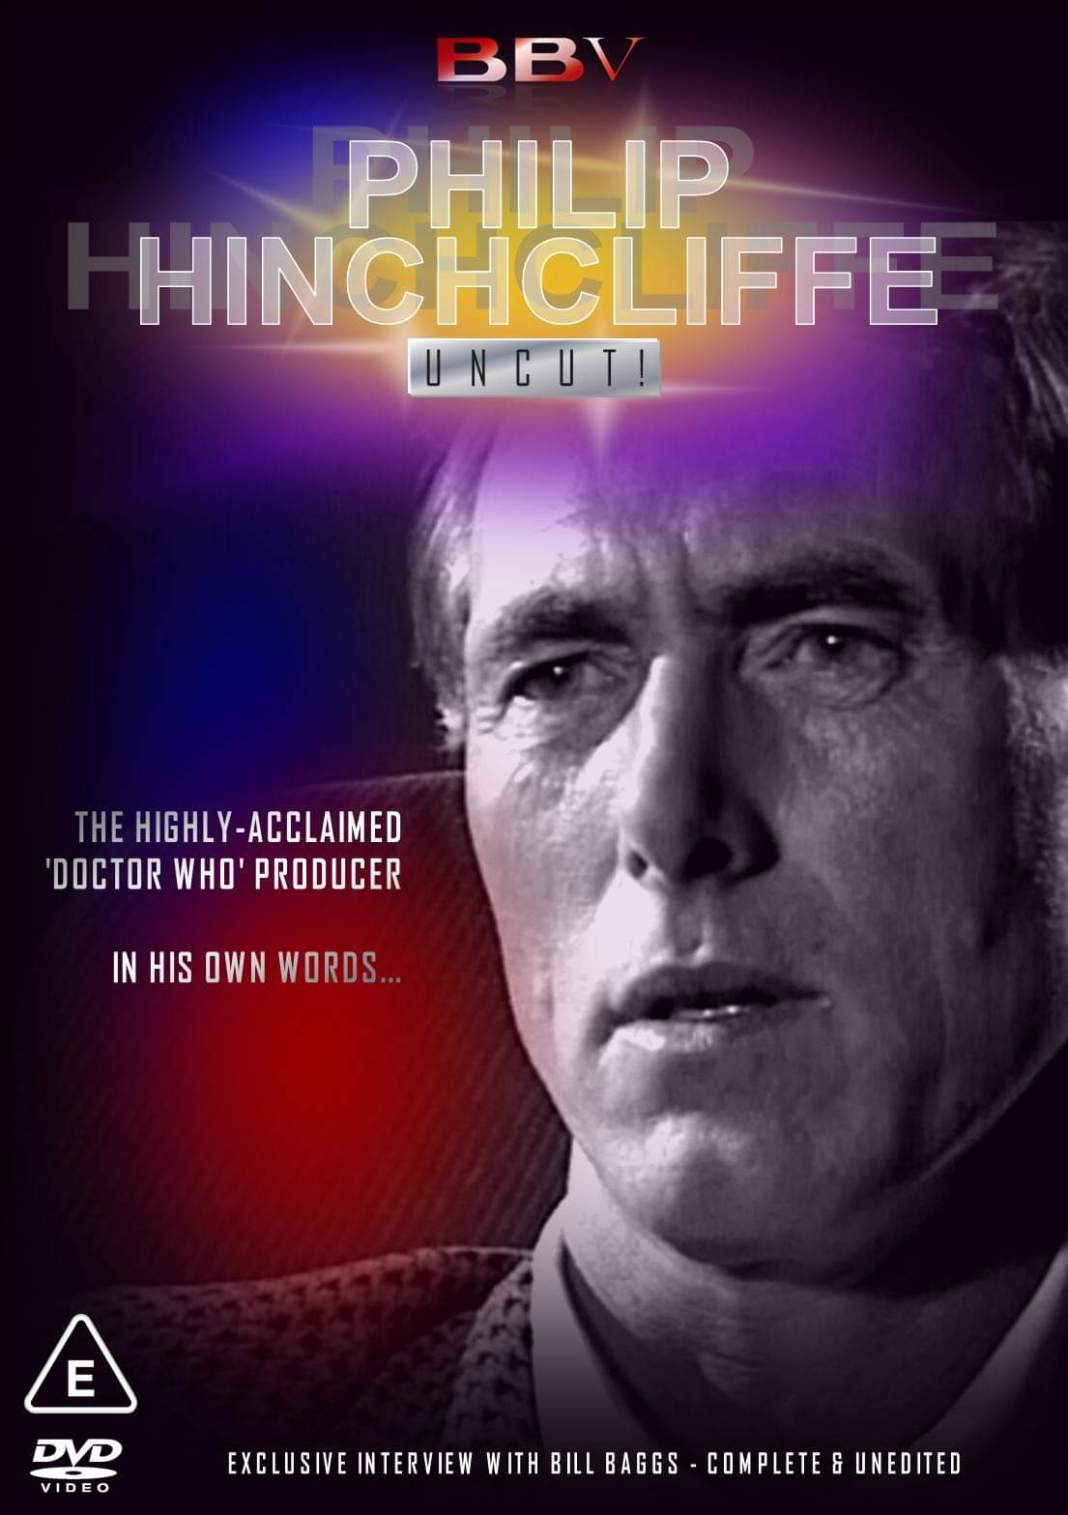 Philip Hinchcliffe: Uncut. (c) BBV Productions